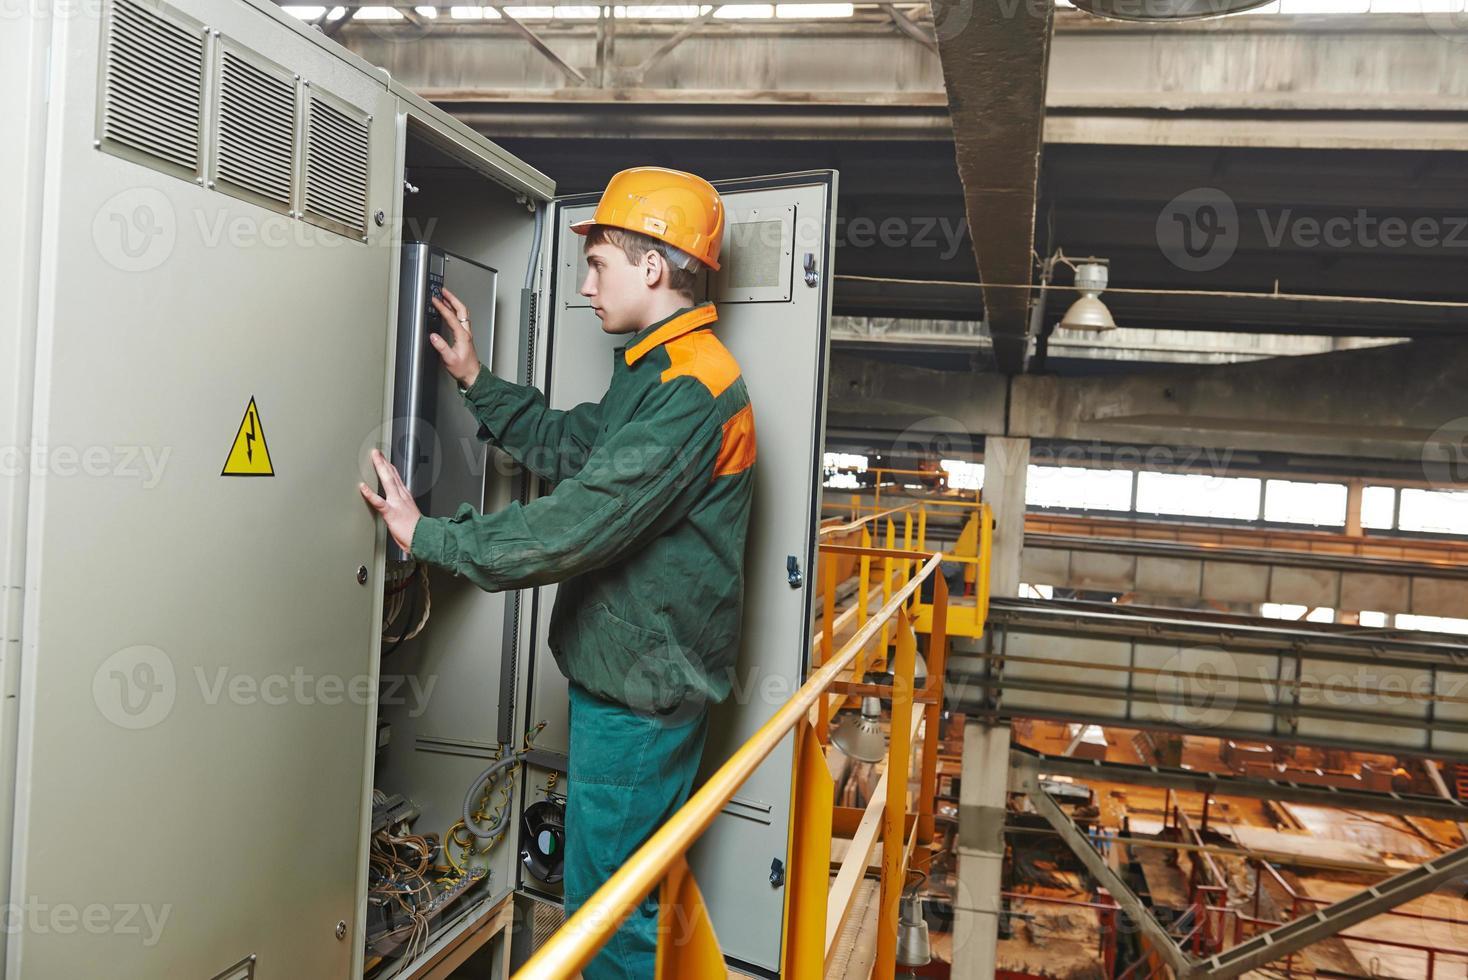 elektricien ingenieur werknemer foto